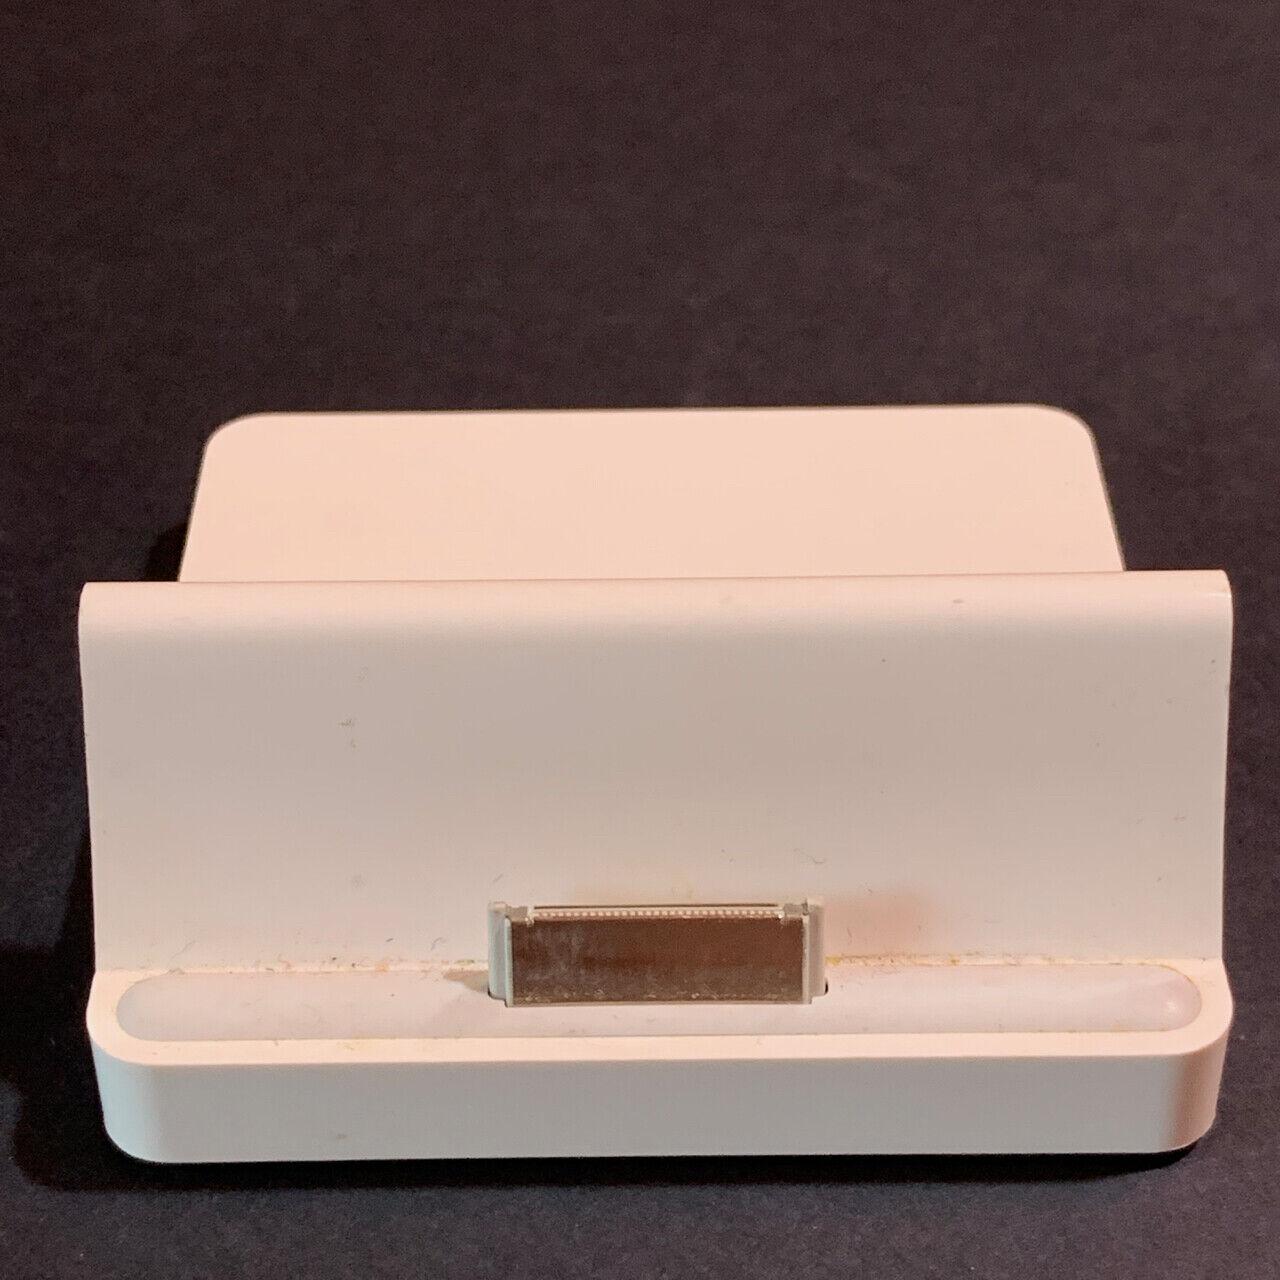 Apple Dock original connecteur 30 broches+cable 30 broches usb&split video/audio